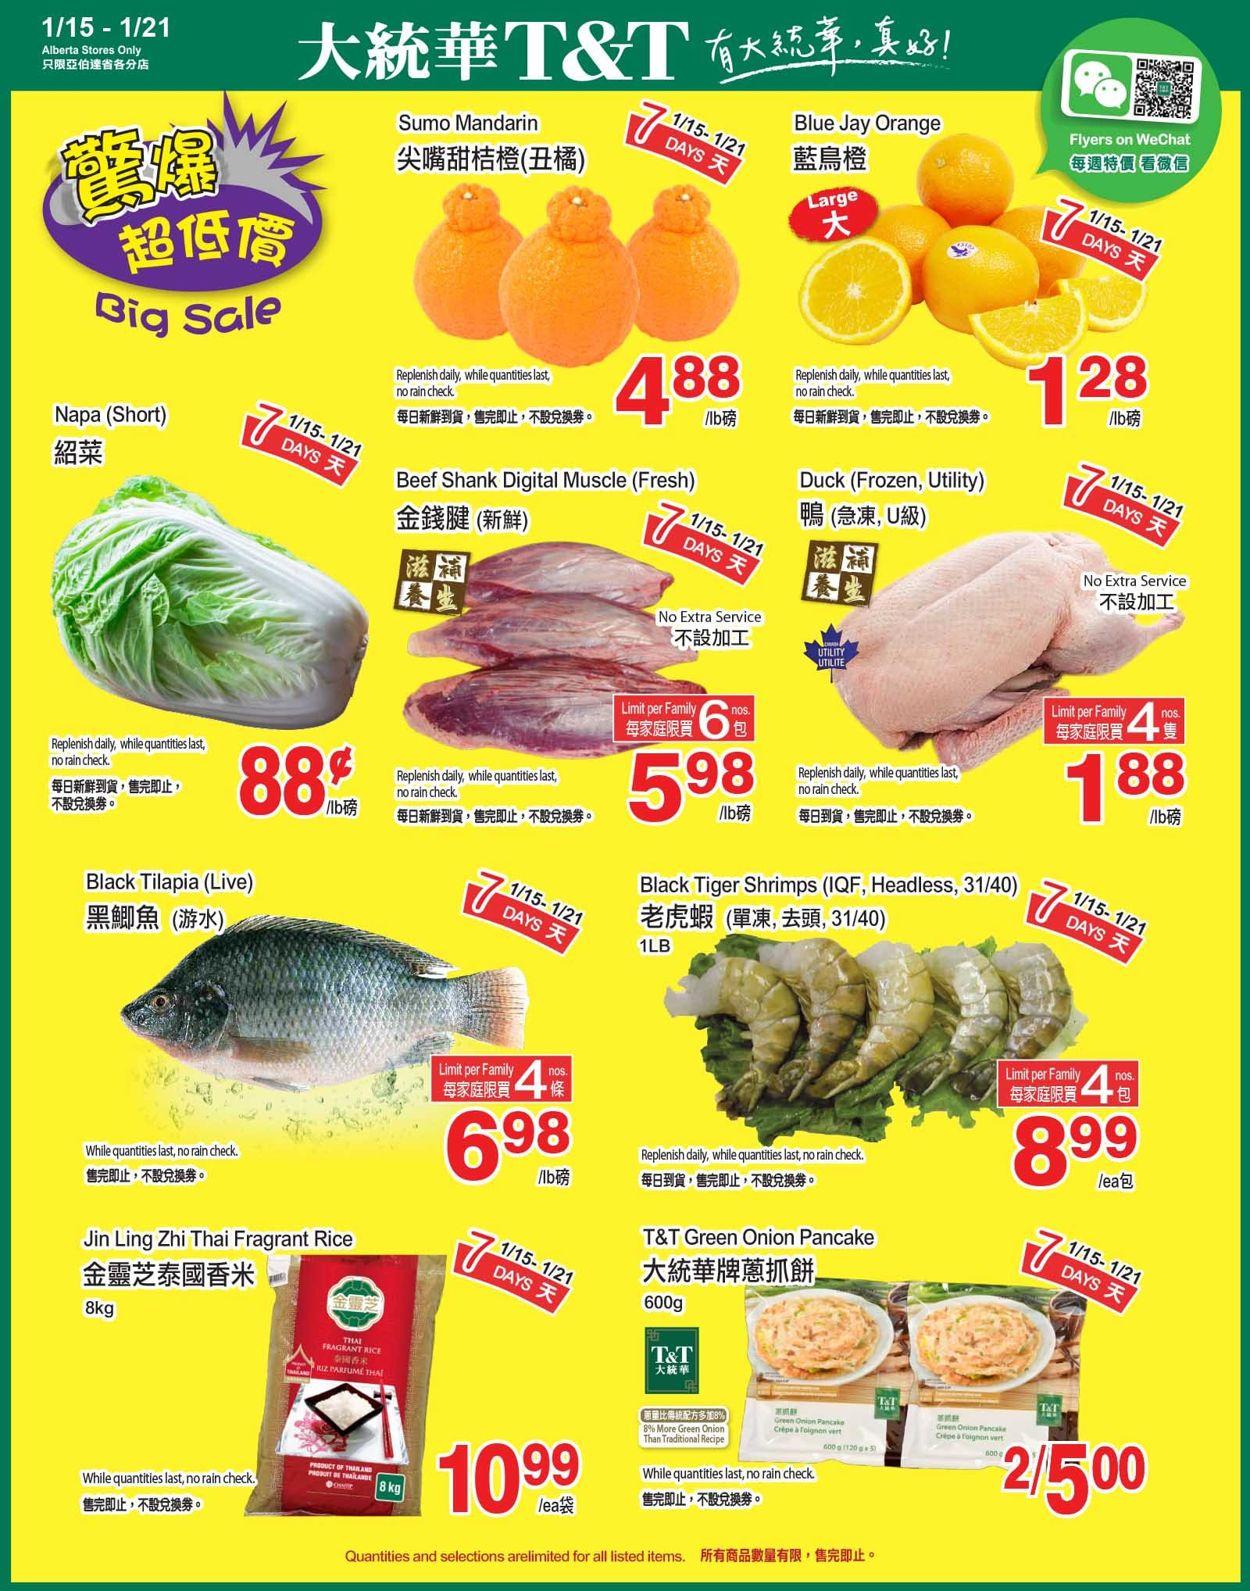 T&T Supermarket - Alberta Flyer - 01/15-01/21/2021